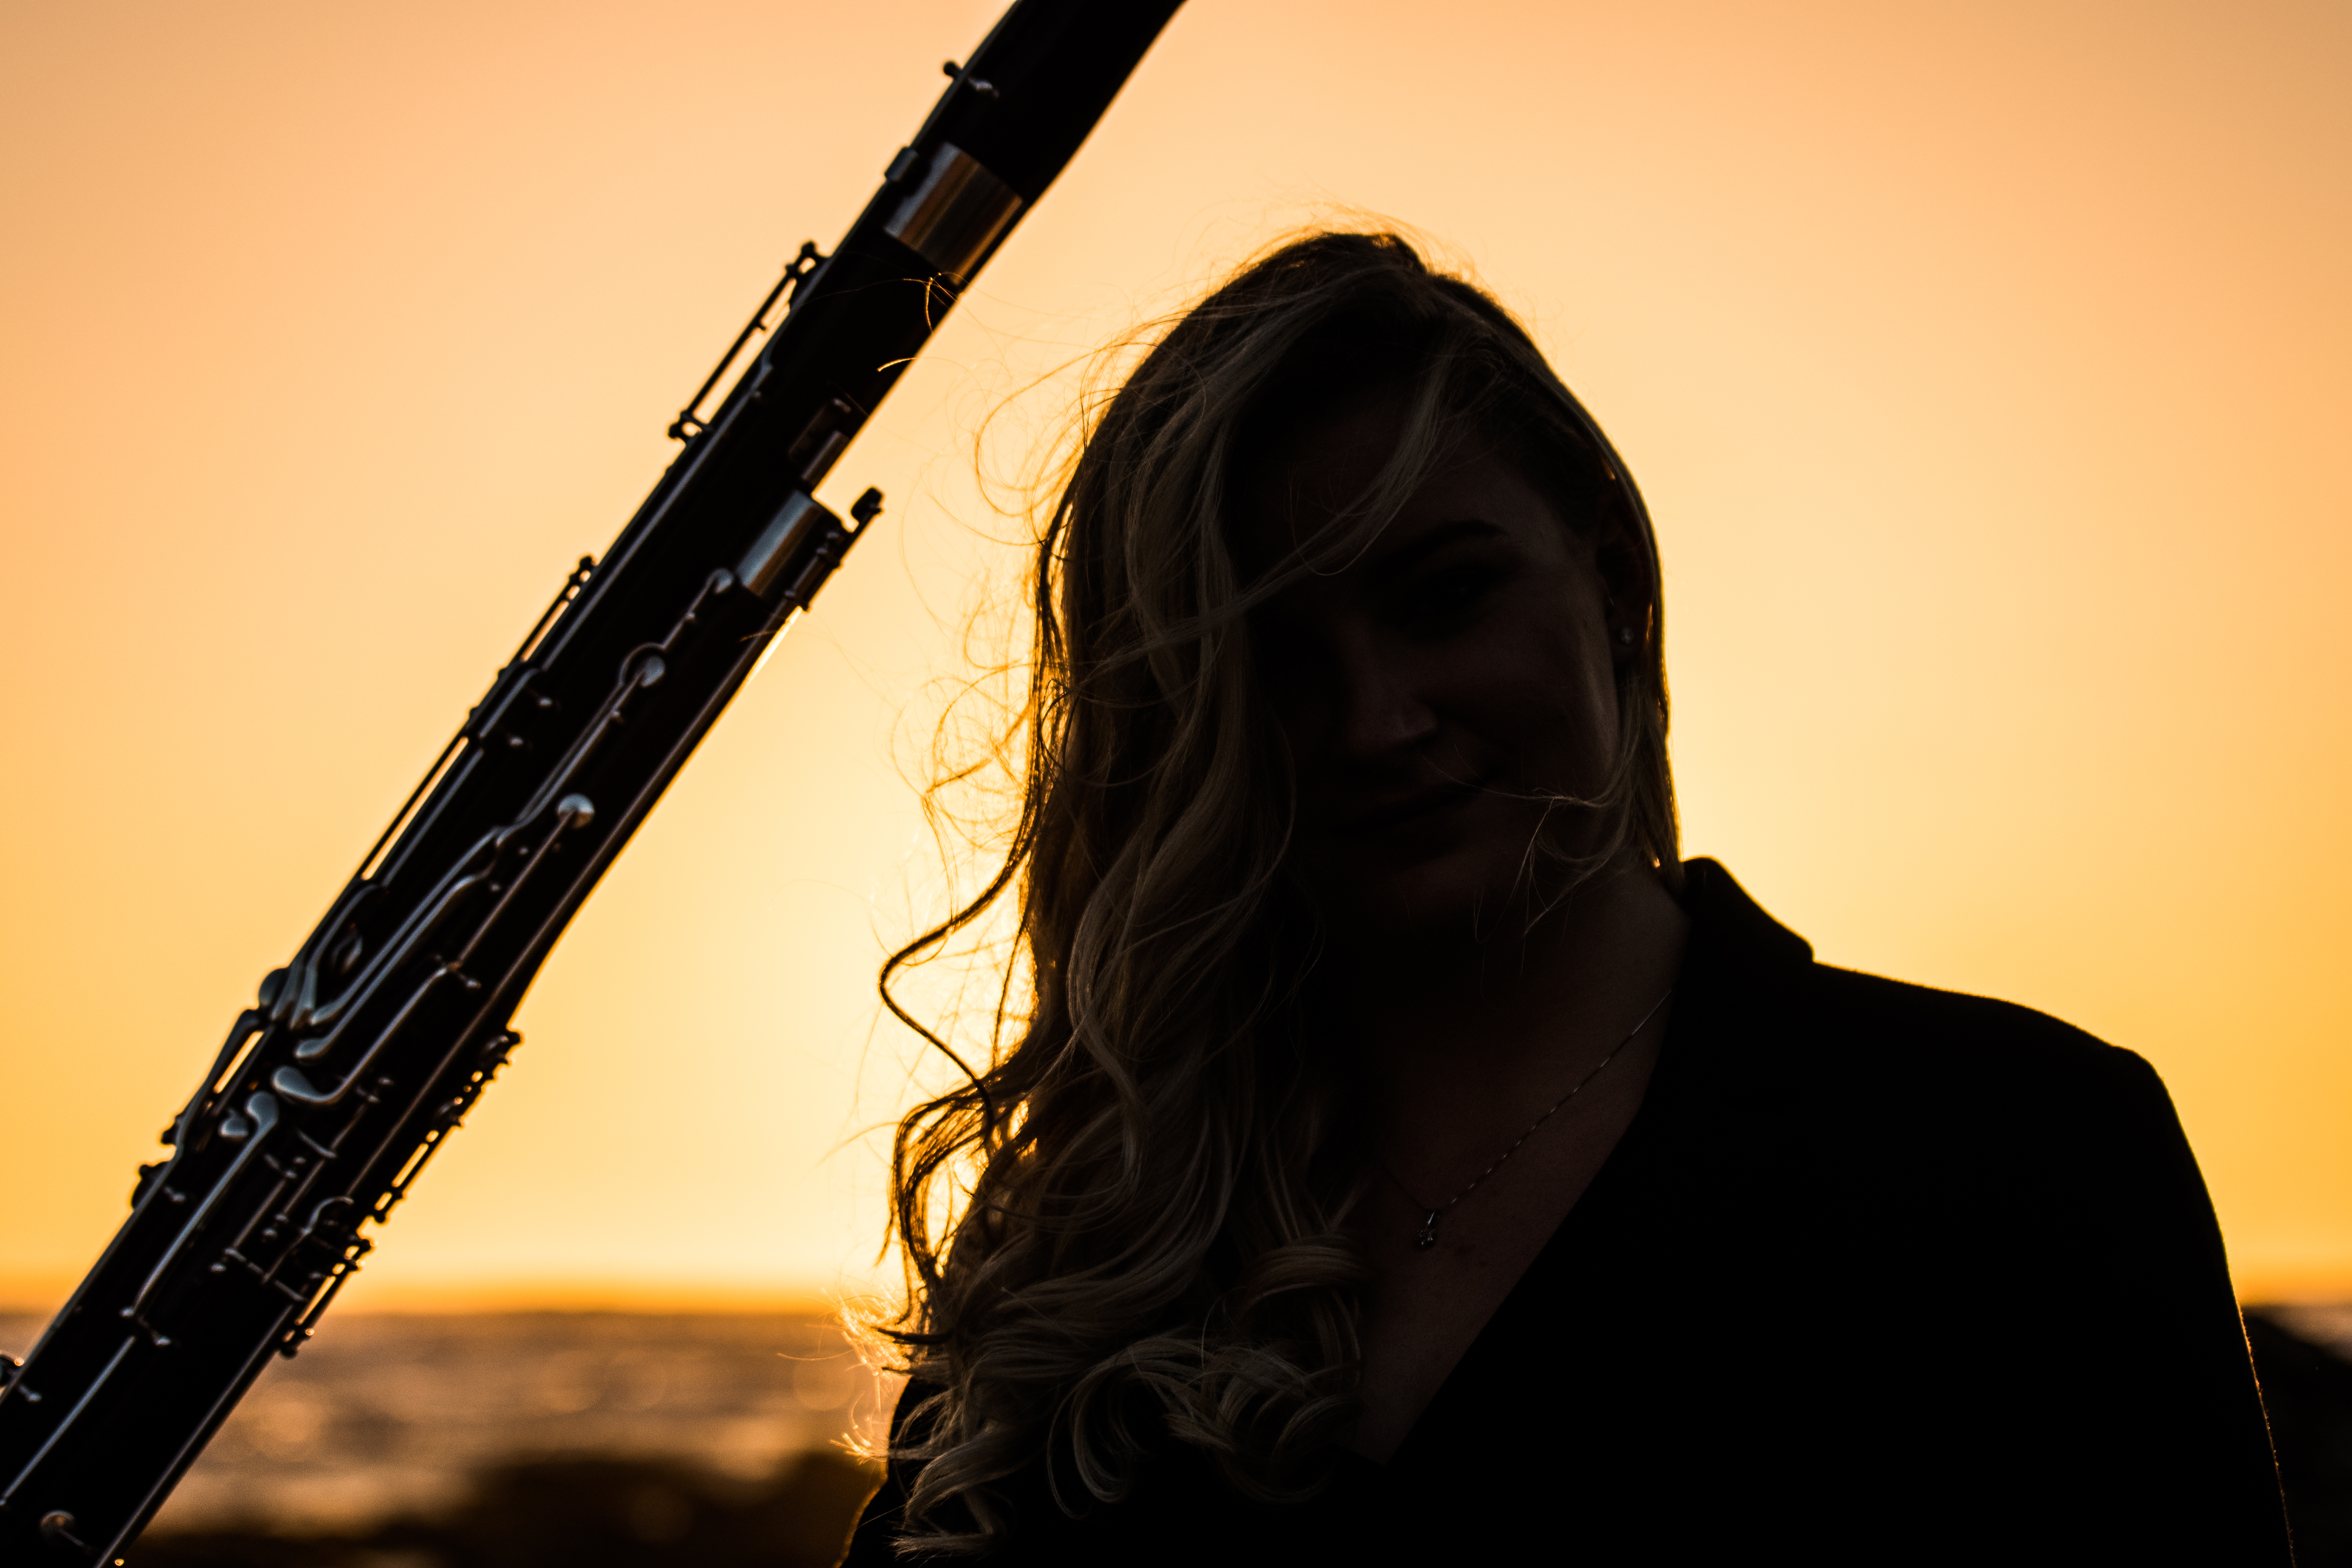 Sunset Photo shoot